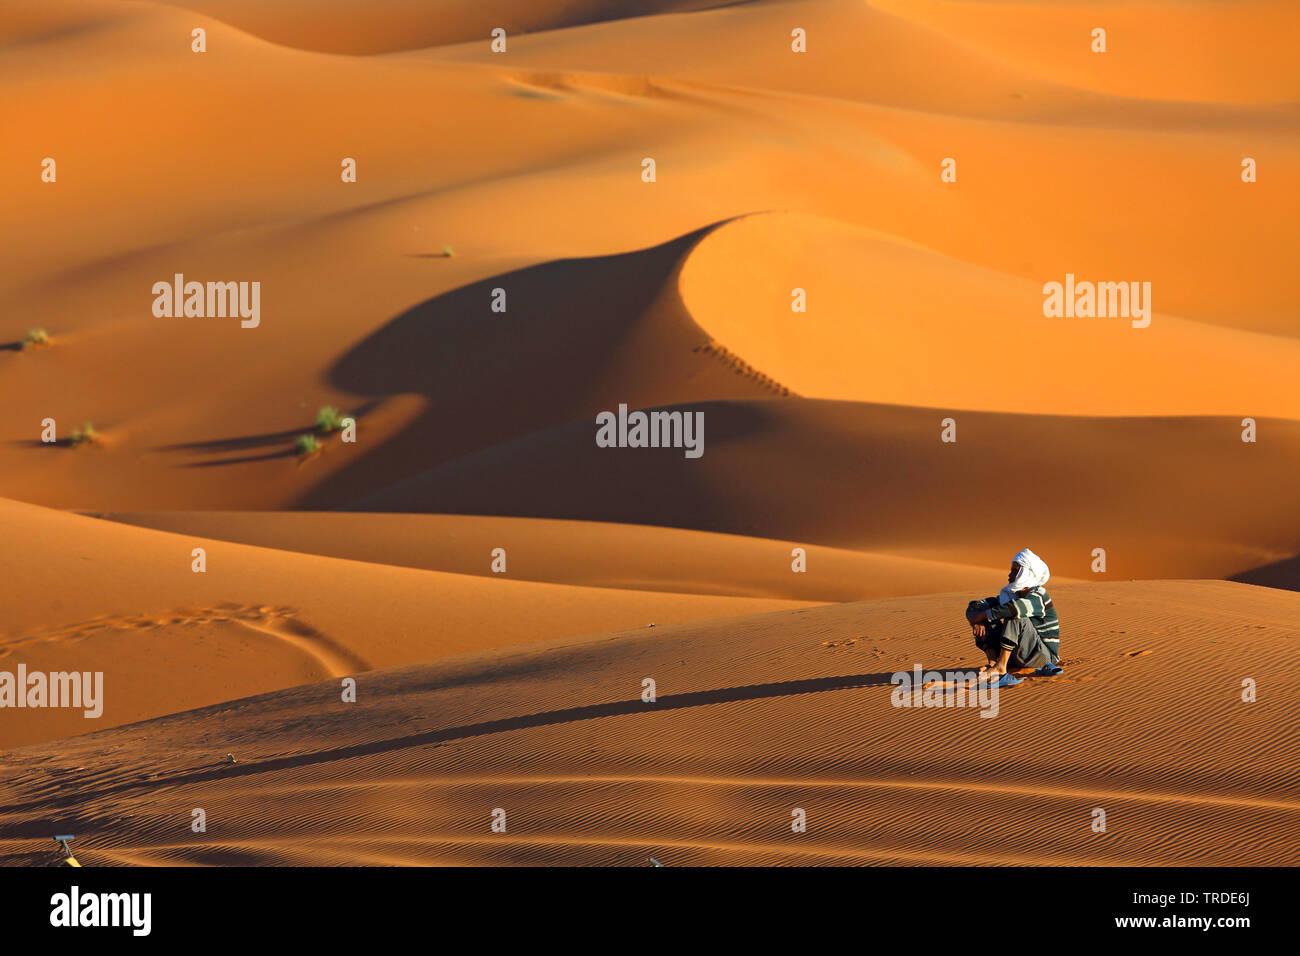 Berber sitzt im Wuestensand, Marokko, Merzouga, Erg Chebbi | Berber sitting in desert sand, Morocco, Merzouga, Erg Chebbi | BLWS501606.jpg [ (c) blick - Stock Image